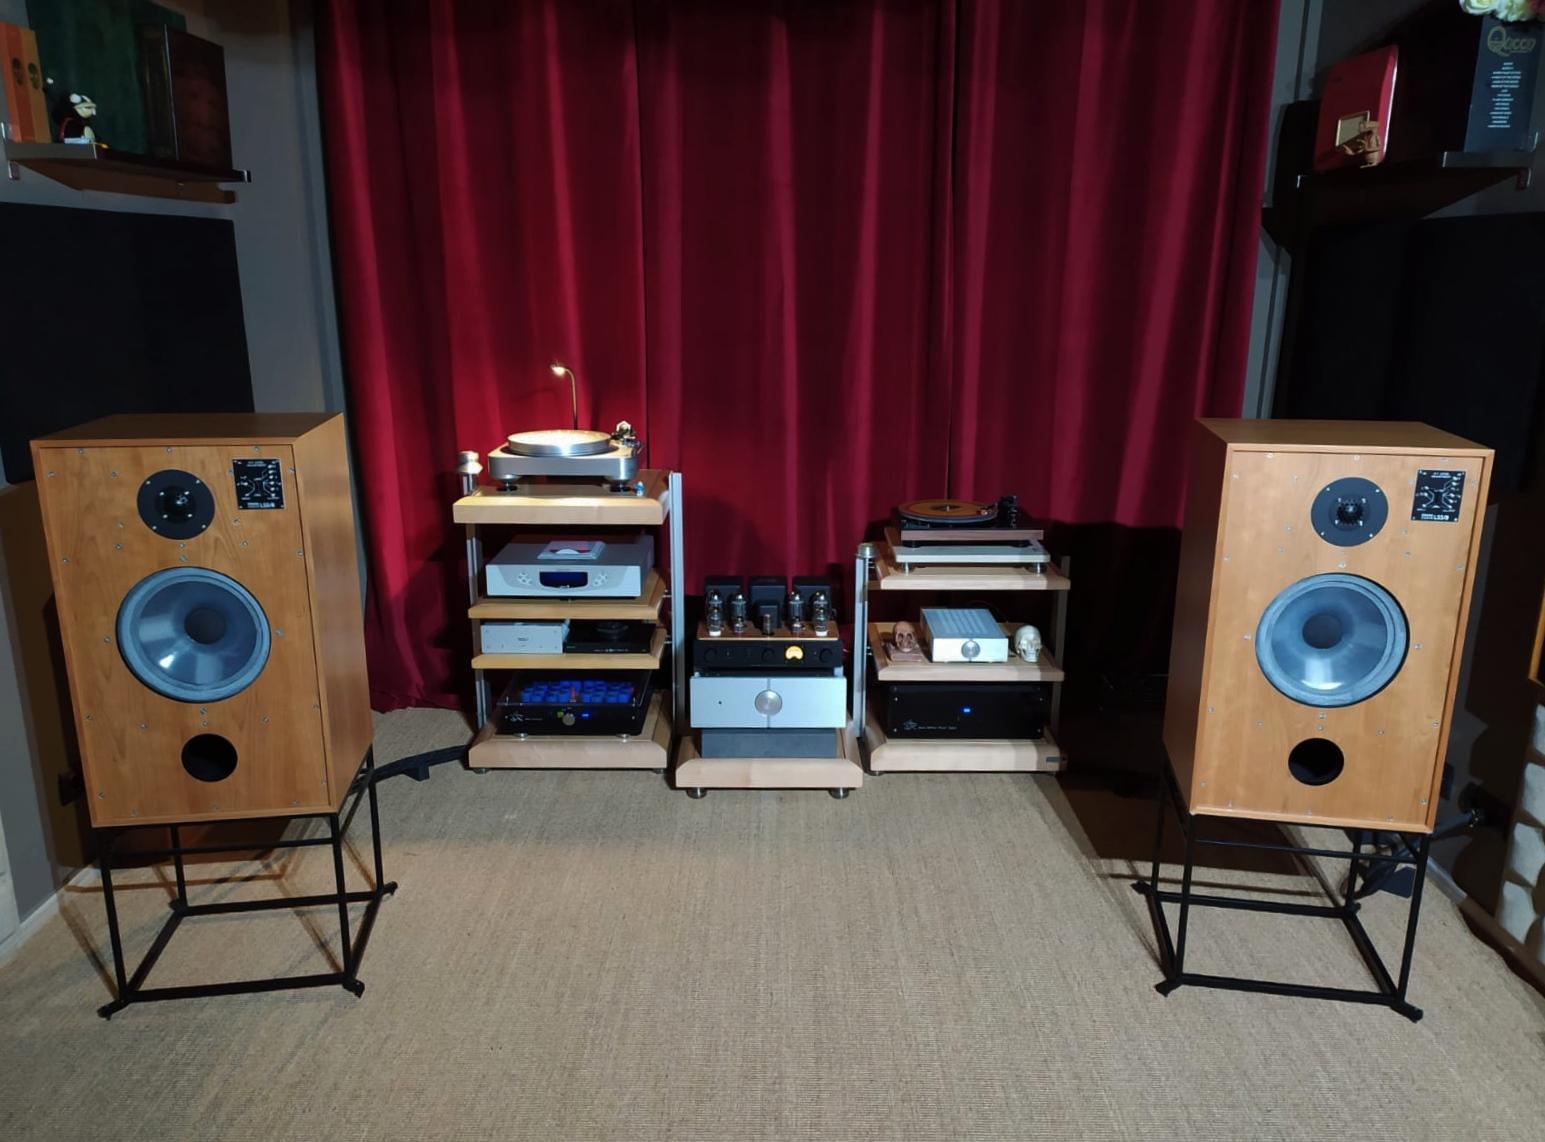 Salas audiofilas - Página 3 Img_2042